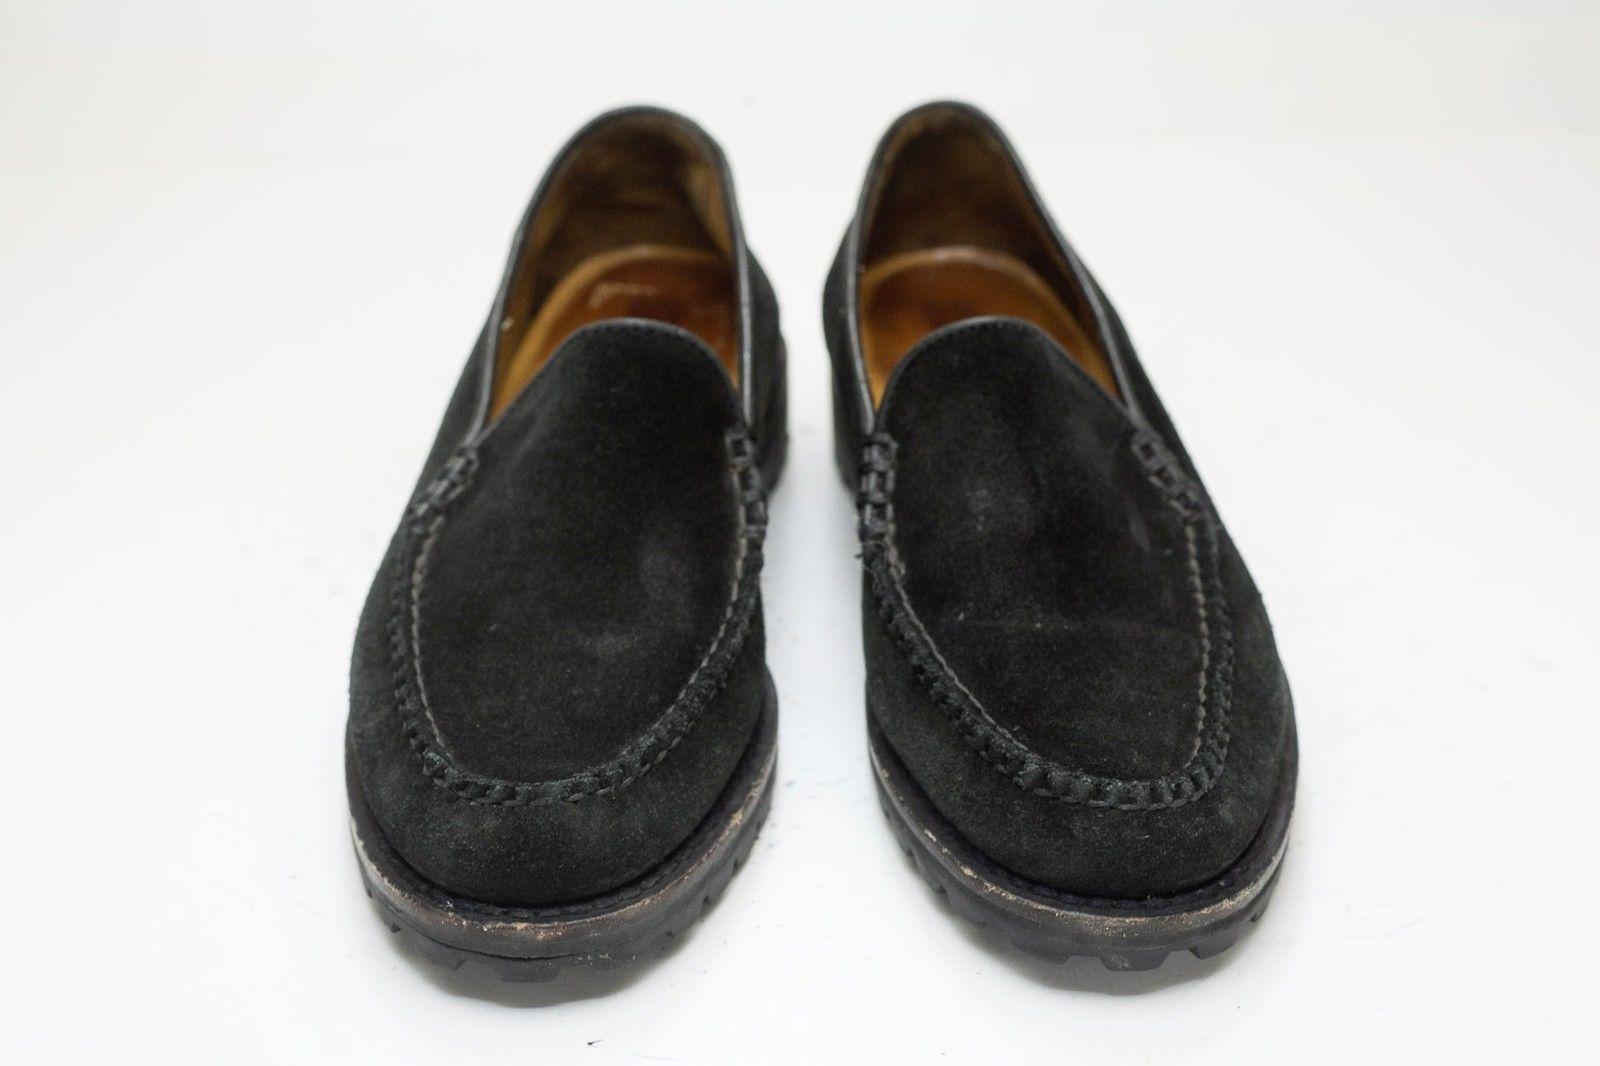 Cole Haan 6 Black Suede Slip On Loafer Women's image 6